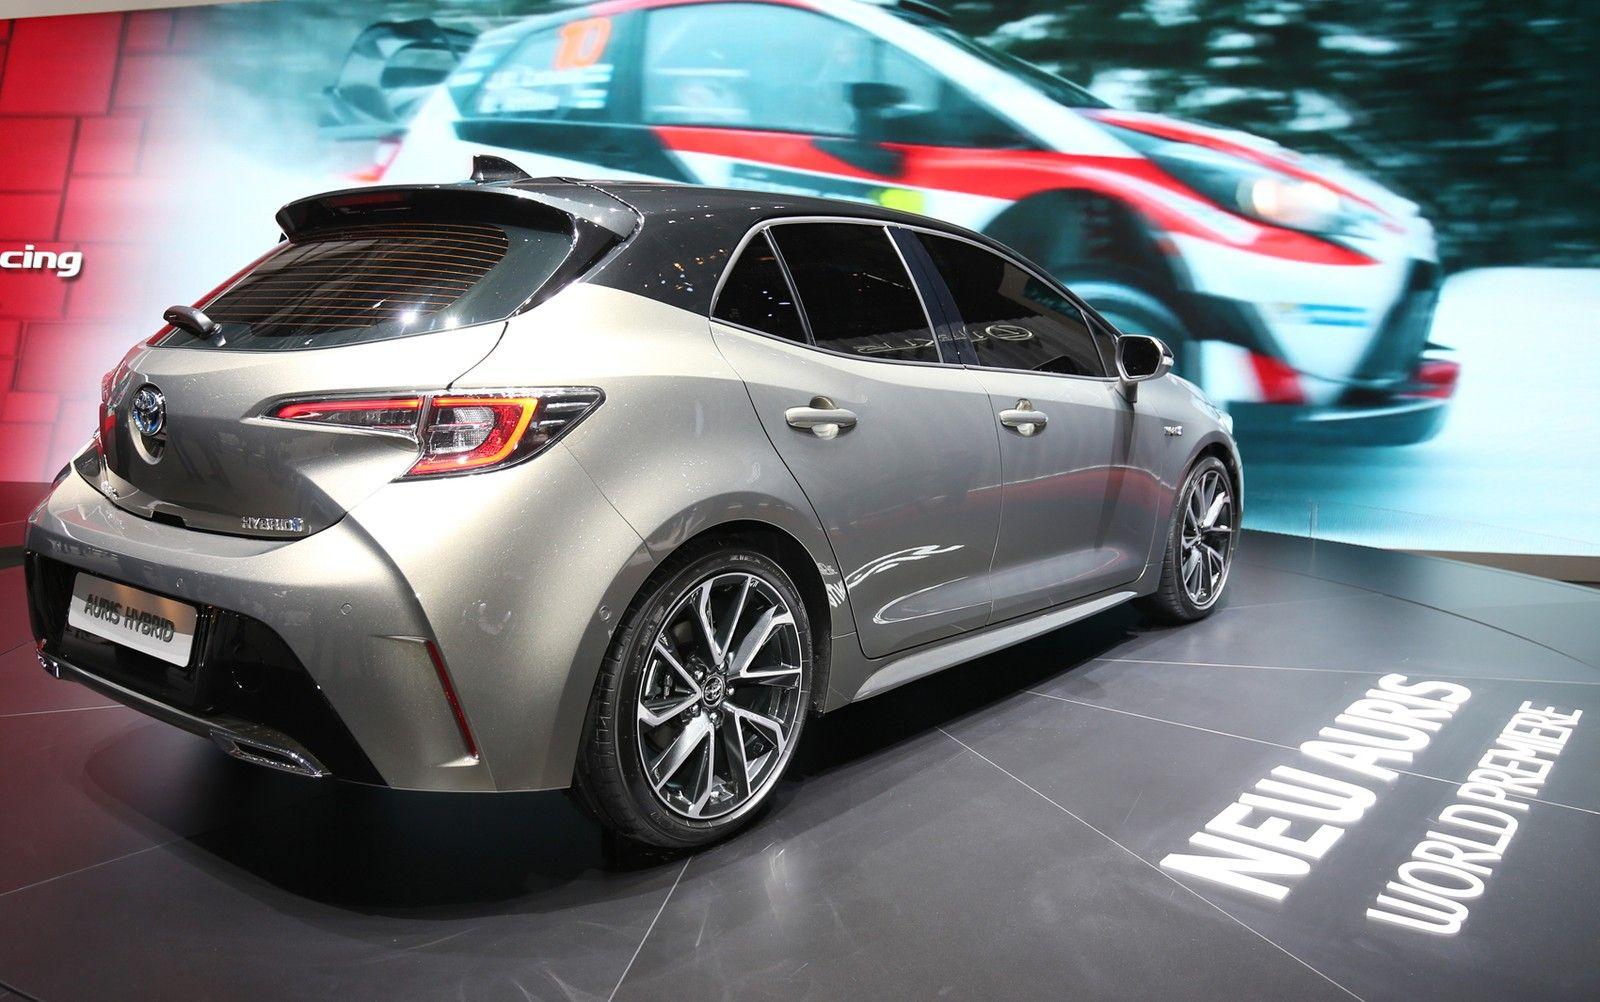 Toyota Passa A Adotar Nome Corolla Em Todas As Versoes Do Modelo